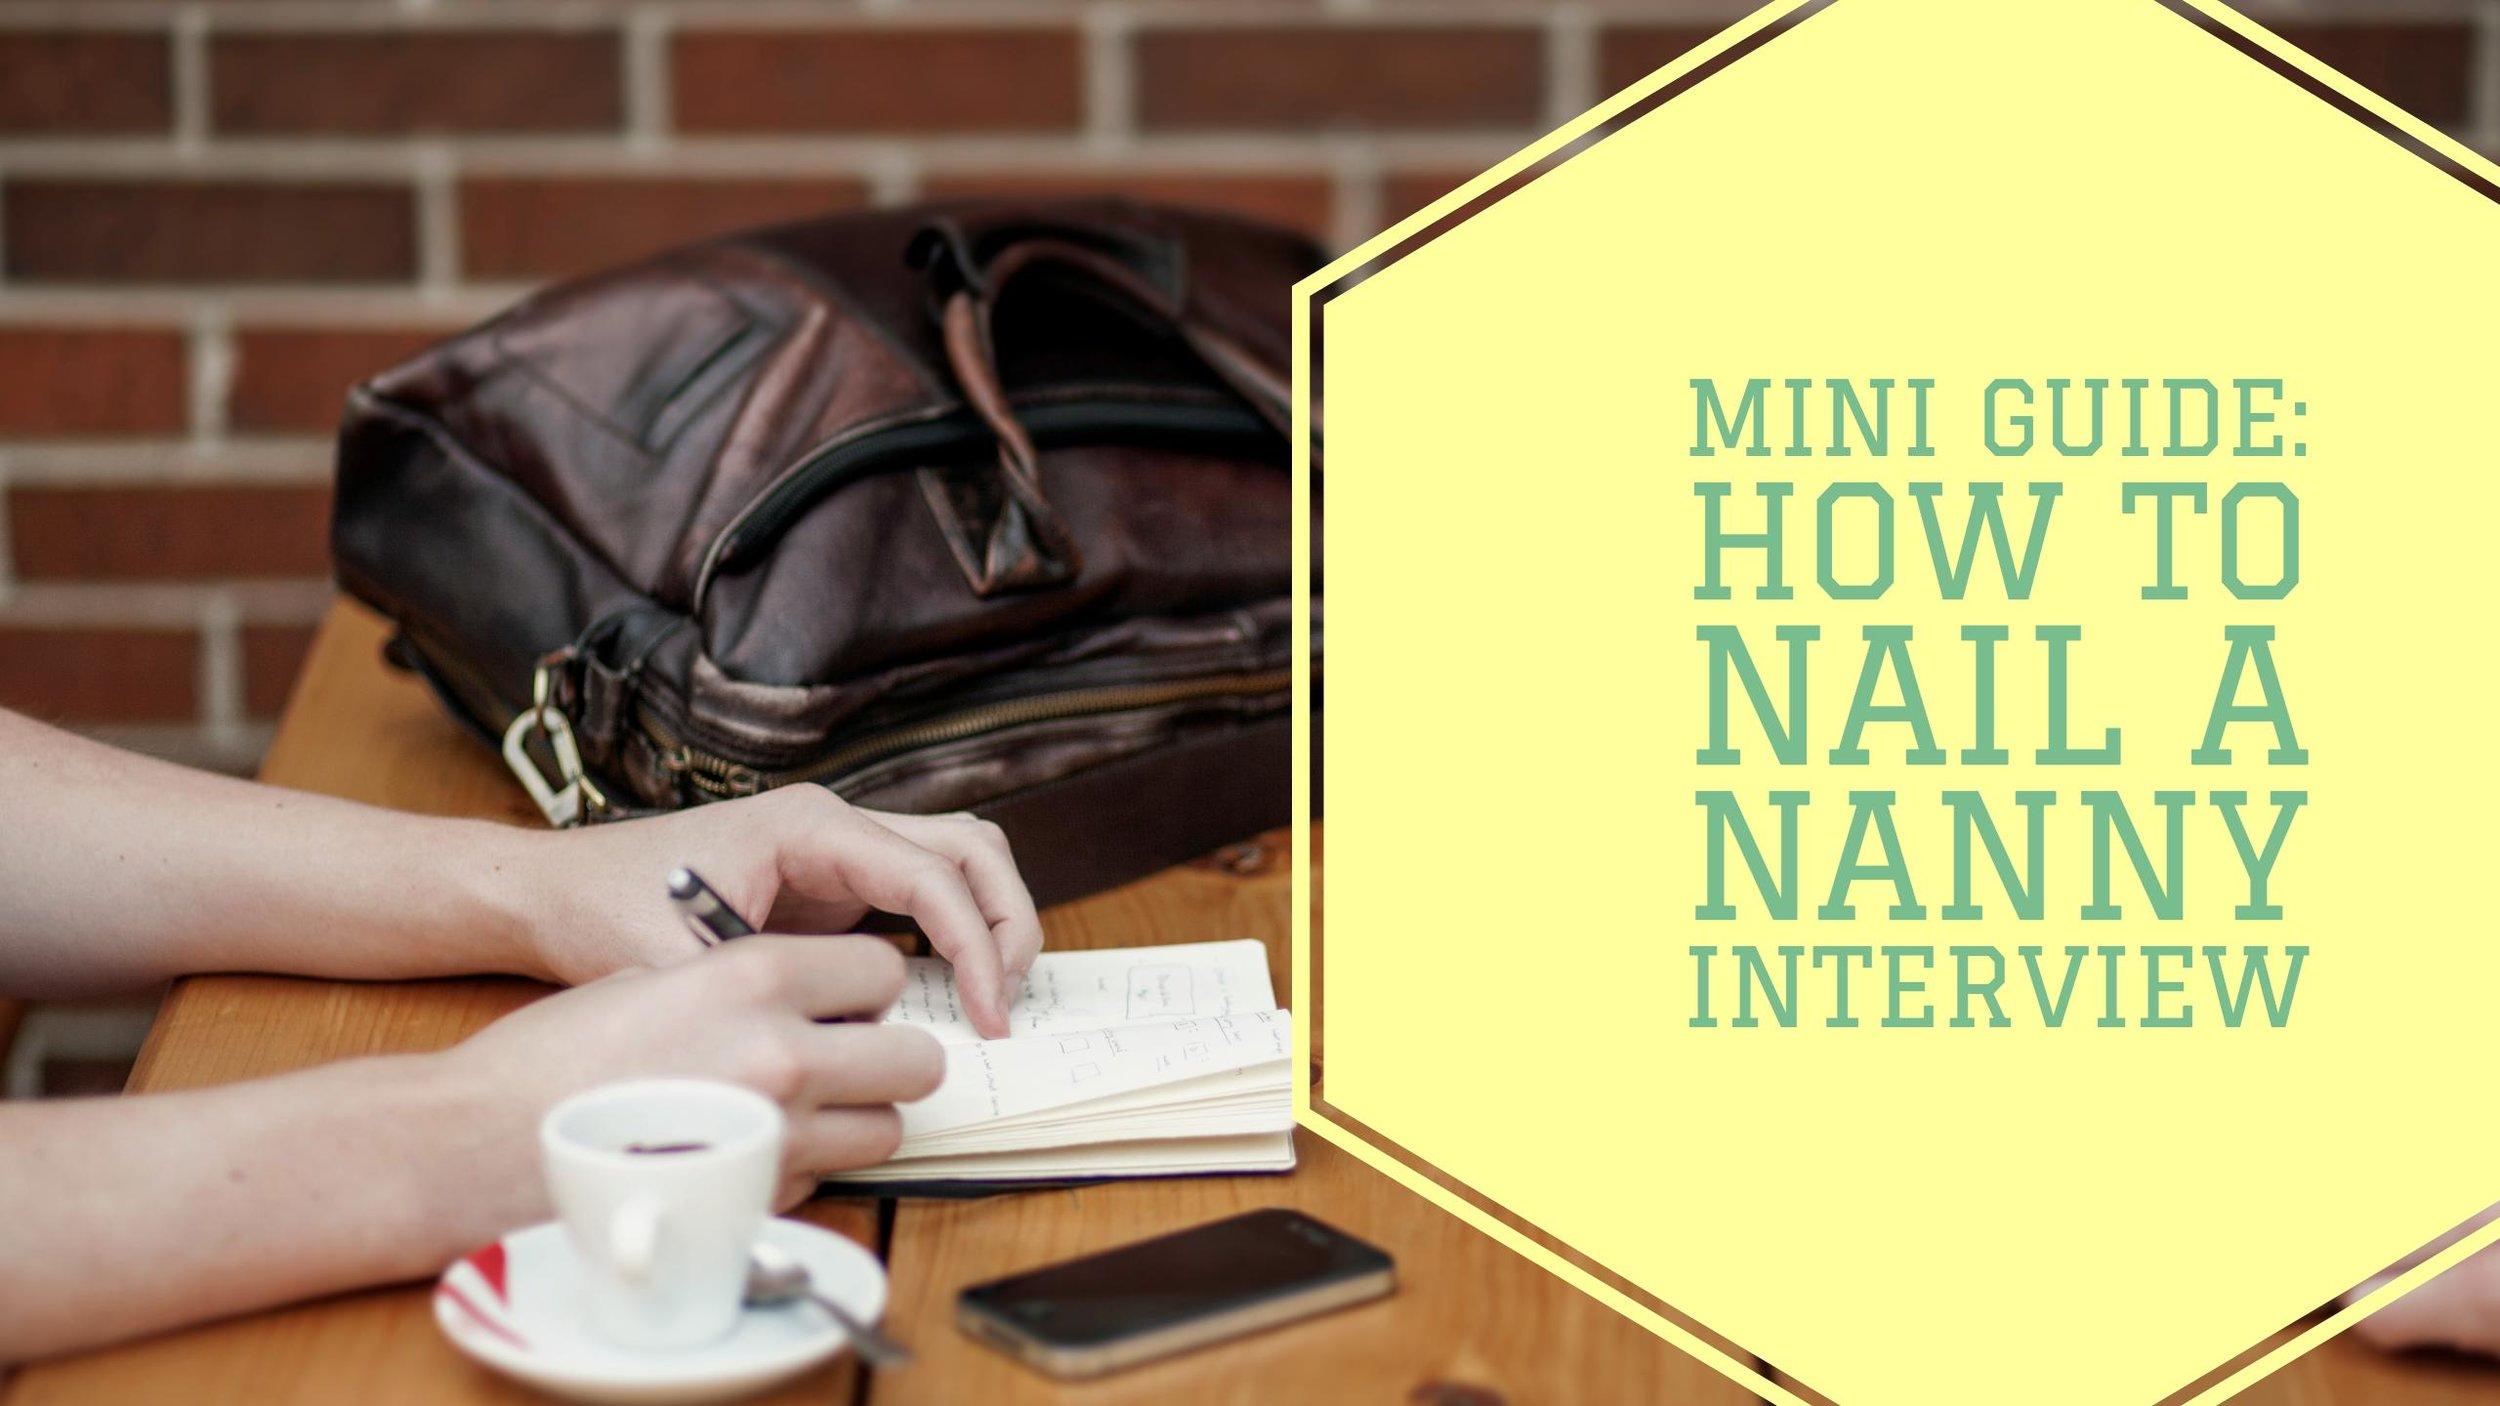 MiniGuide: Nanny Interview